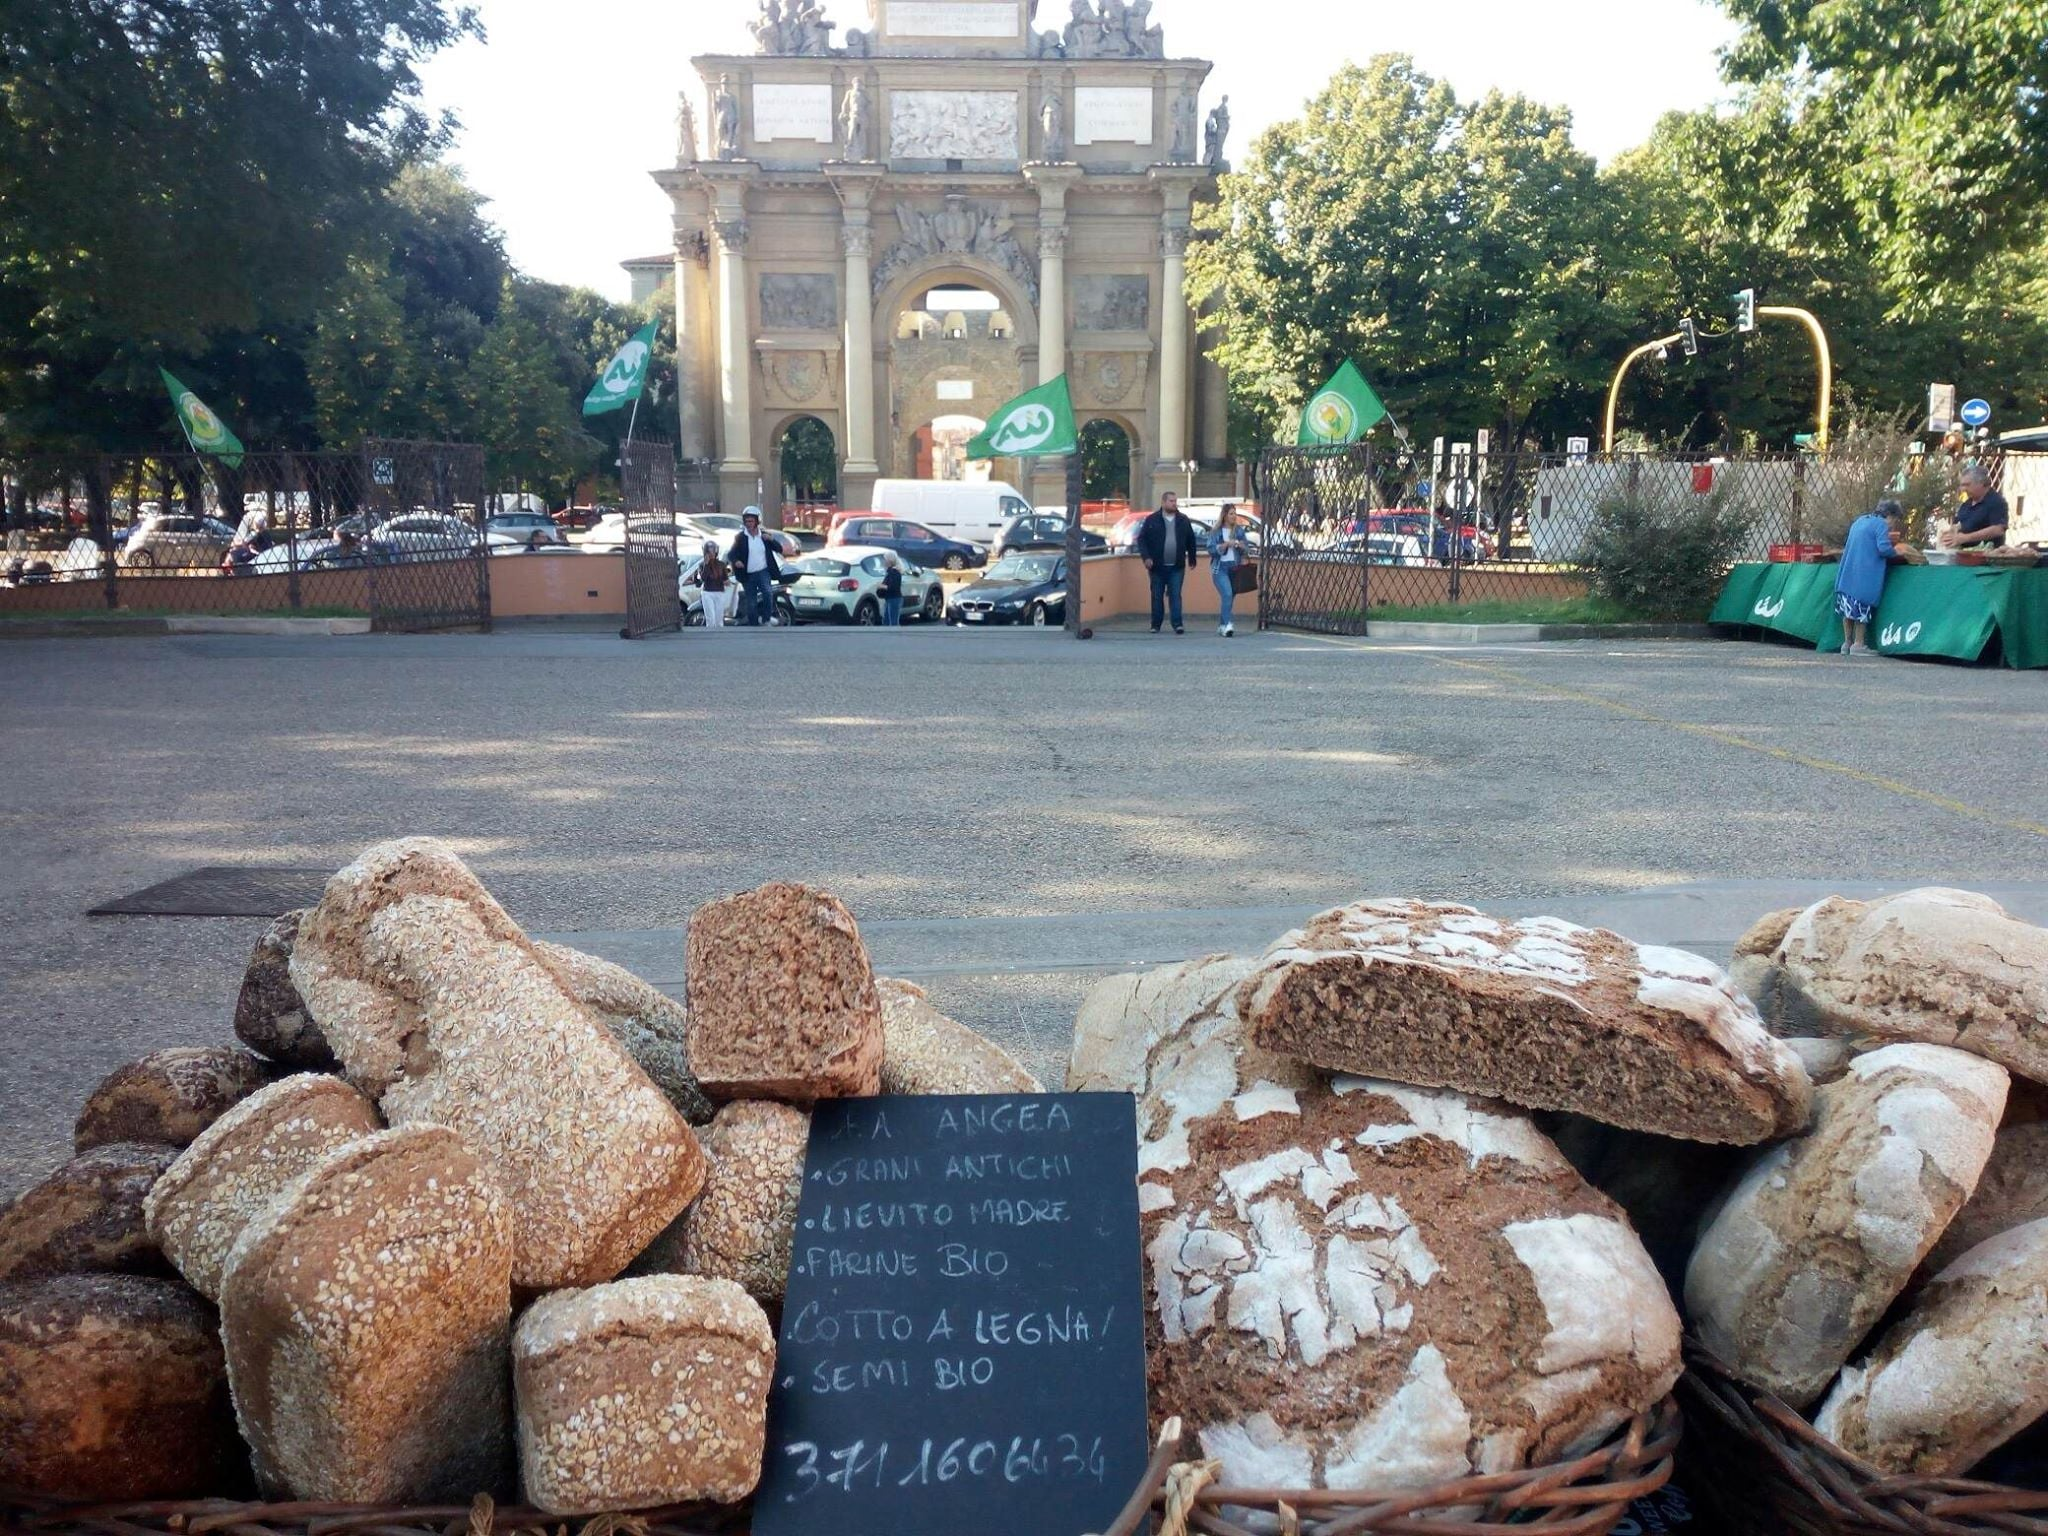 mercato-contadino-parterre-firenze